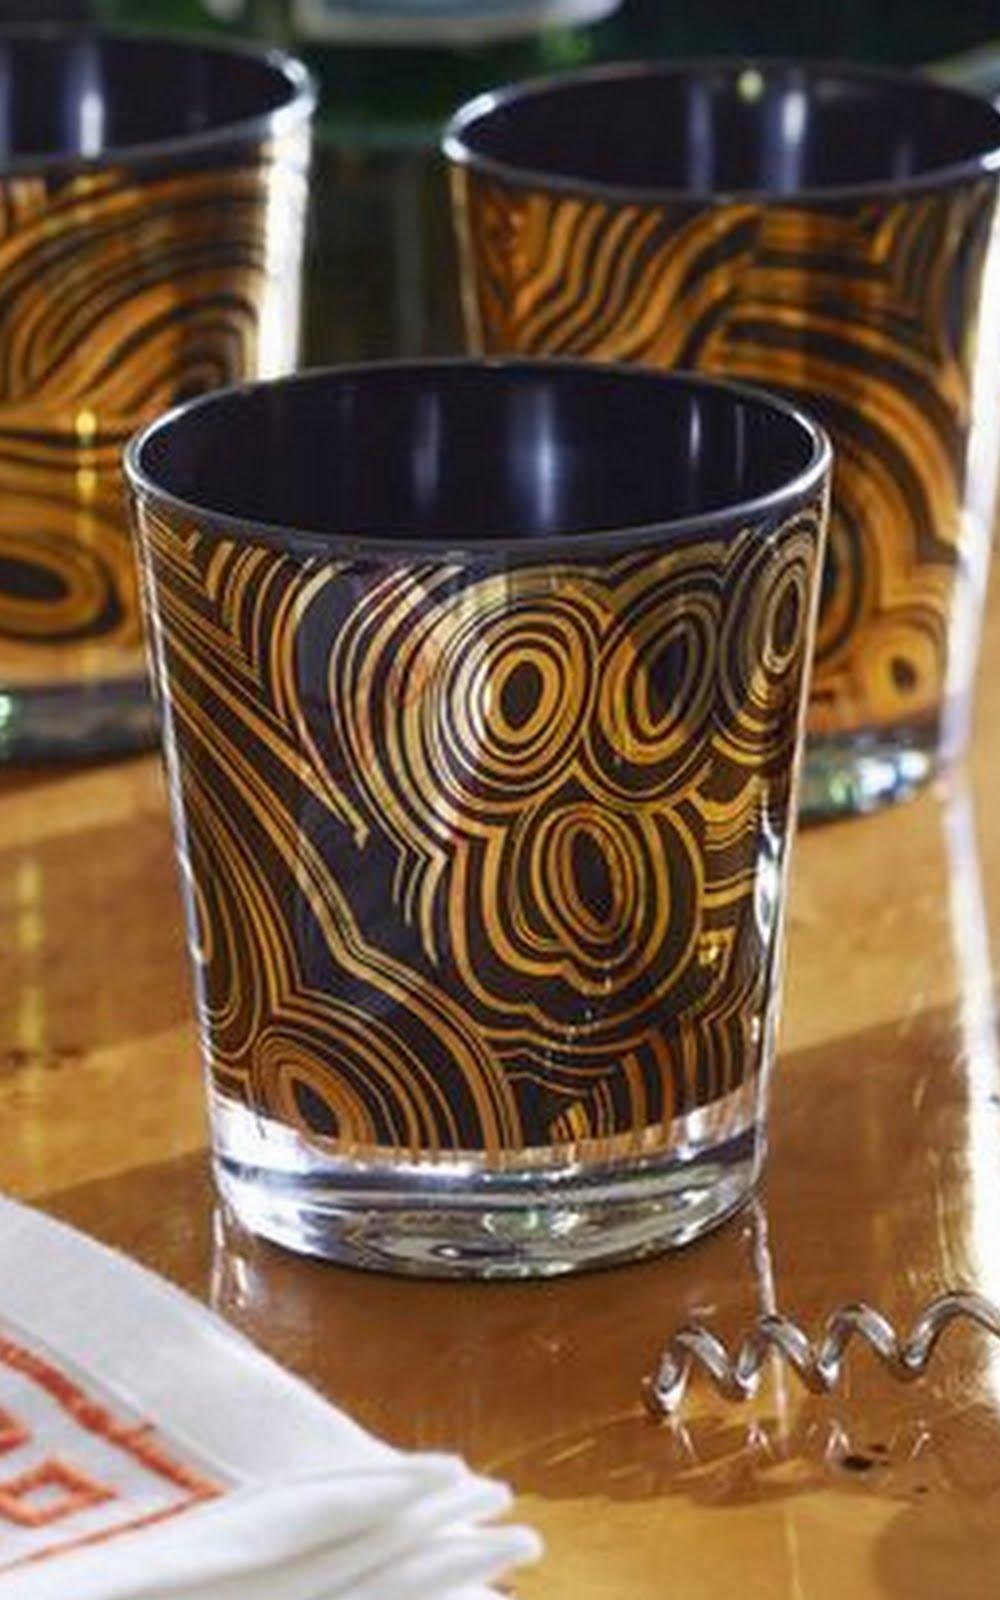 -------Vintage Inspired Glassware-----